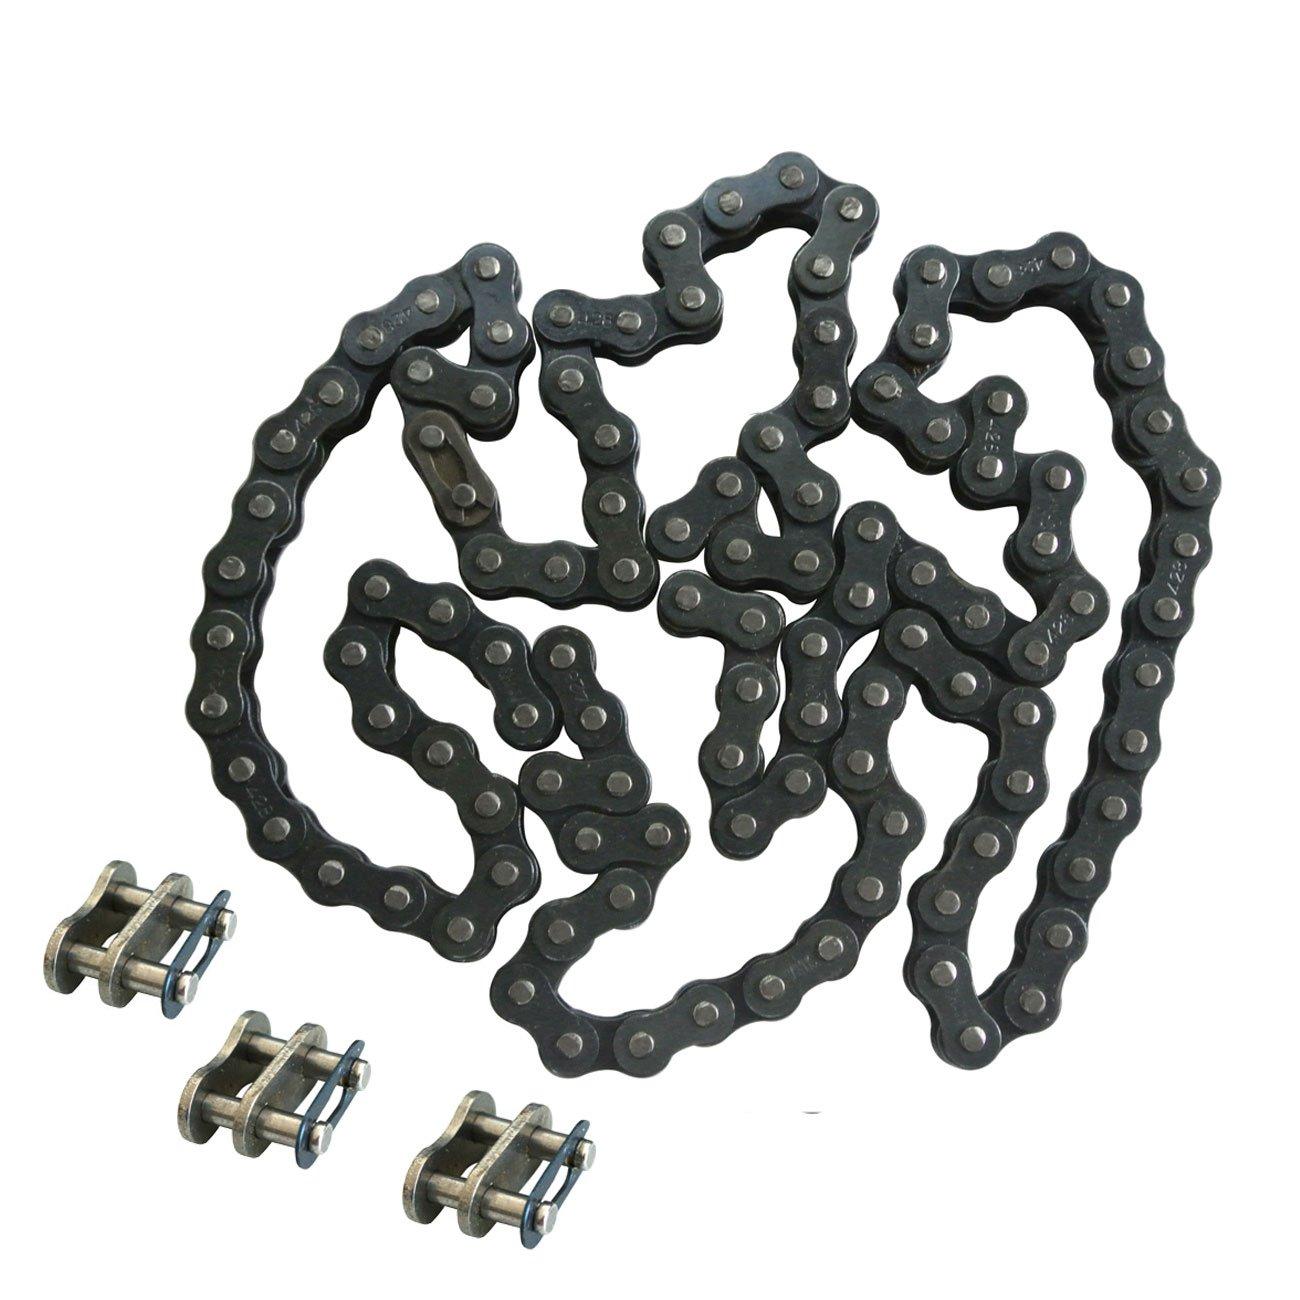 New Drive Chain 428-112 Links Fit Pit Bike Dirt Bike With 3Pc 428 Chain Master Link JL JIANGLI LEGEND